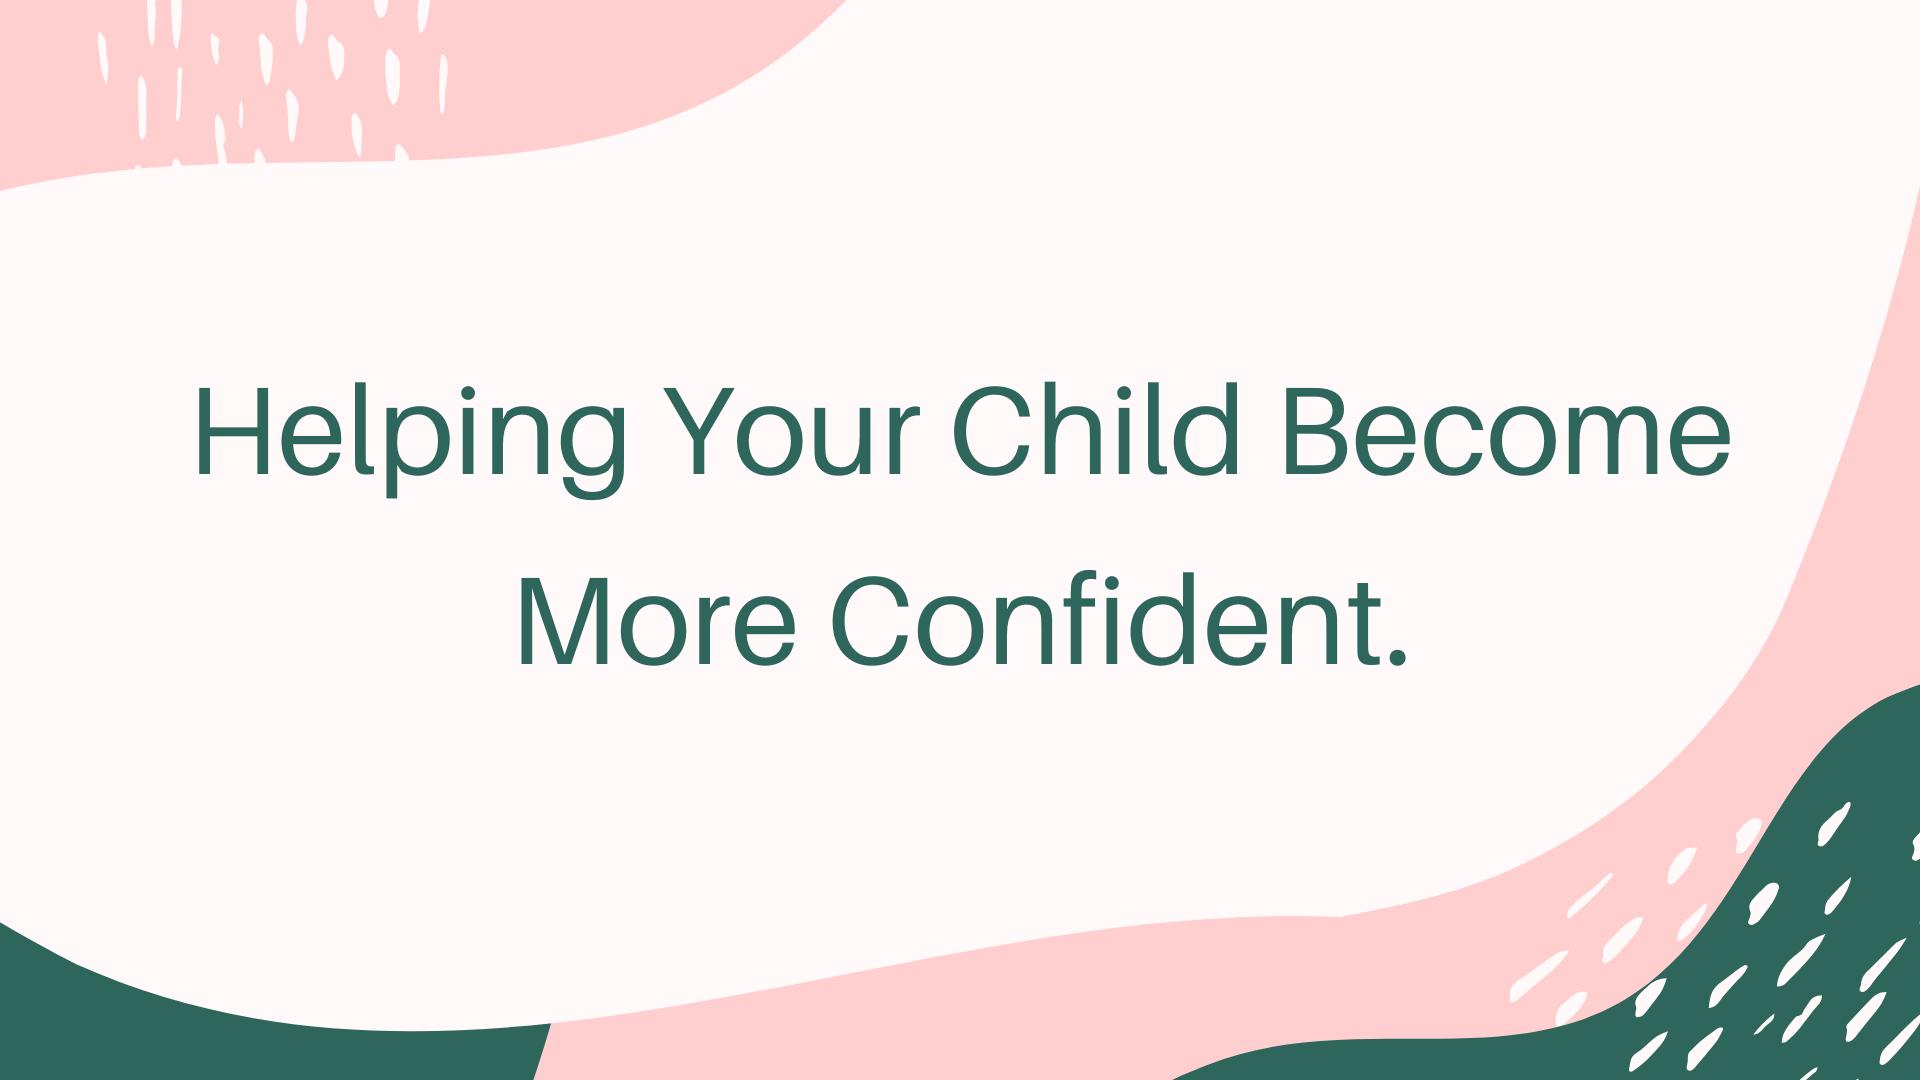 Child become more confident